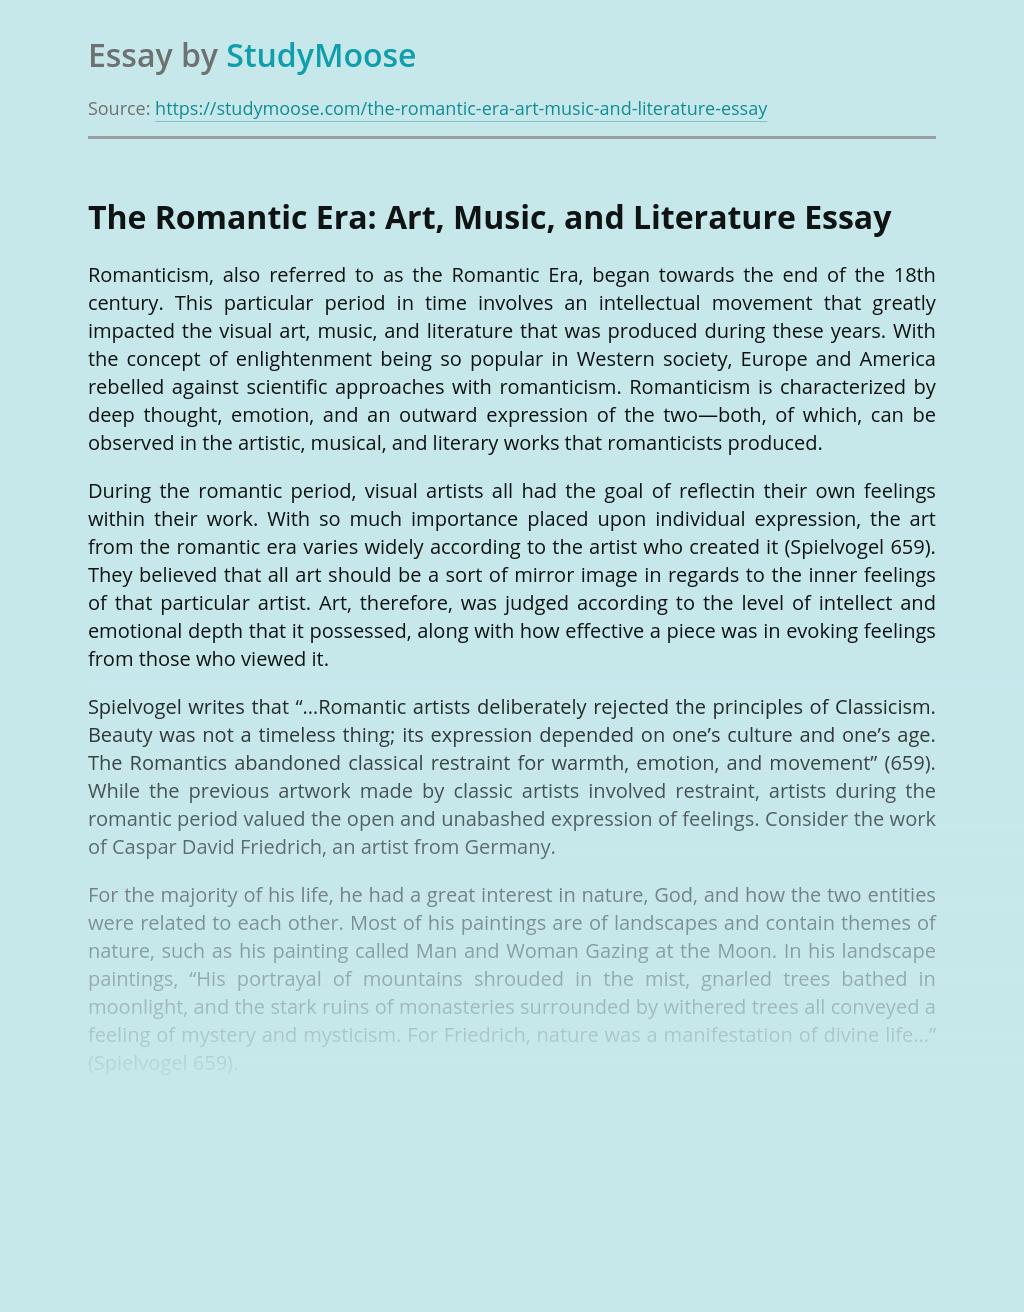 The Romantic Era: Art, Music, and Literature